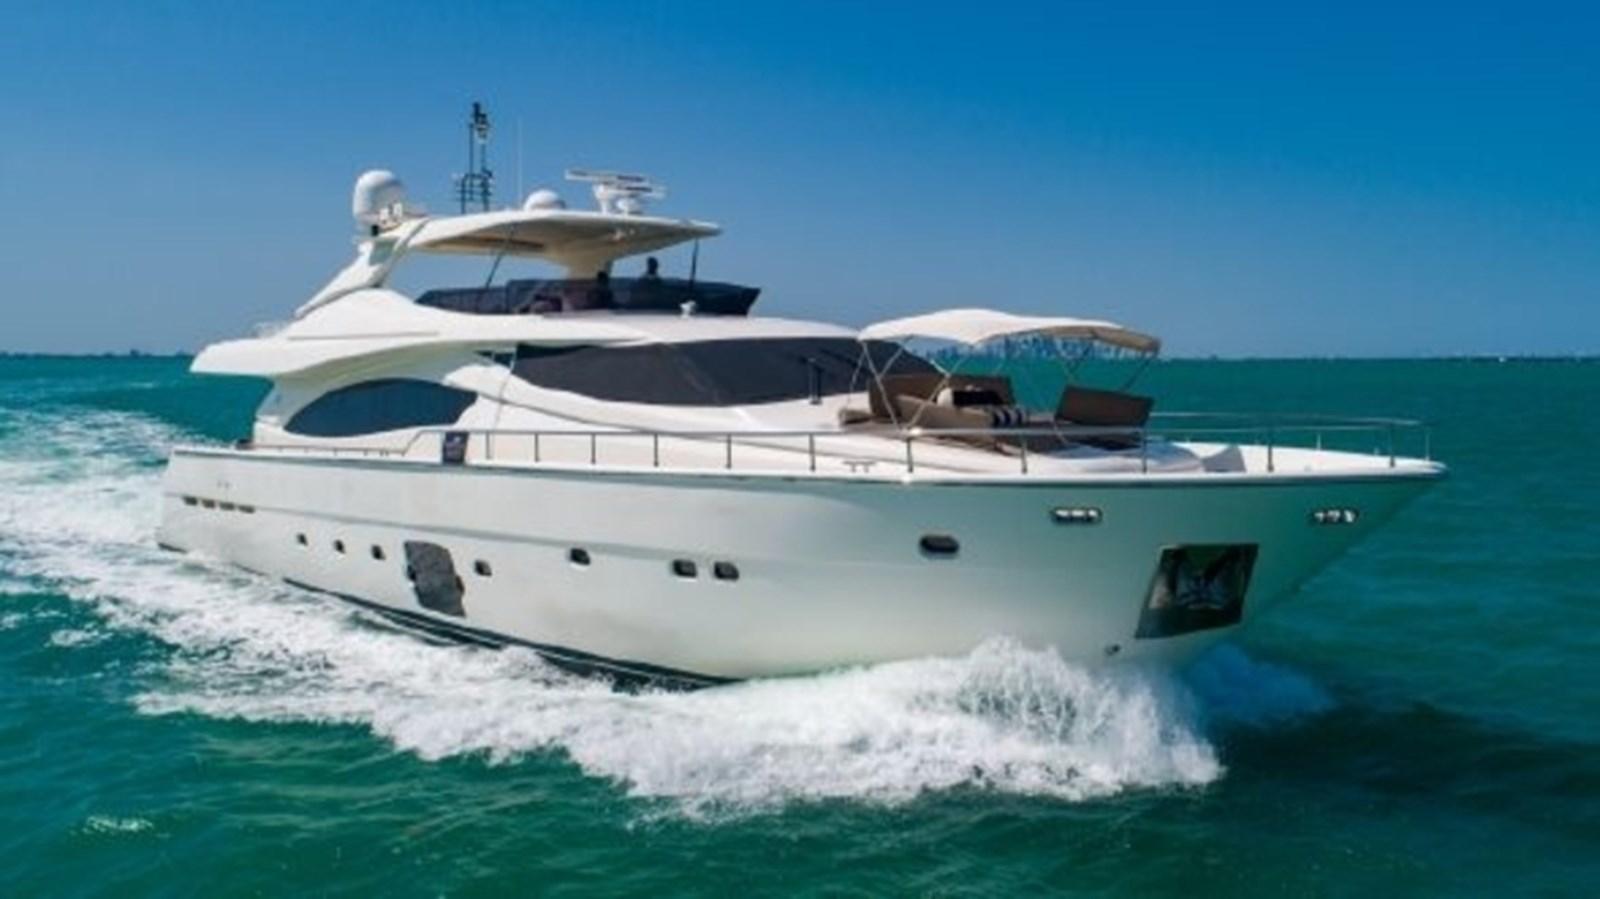 Webp.net-resizeimage 2006 FERRETTI YACHTS  Motor Yacht 2929670